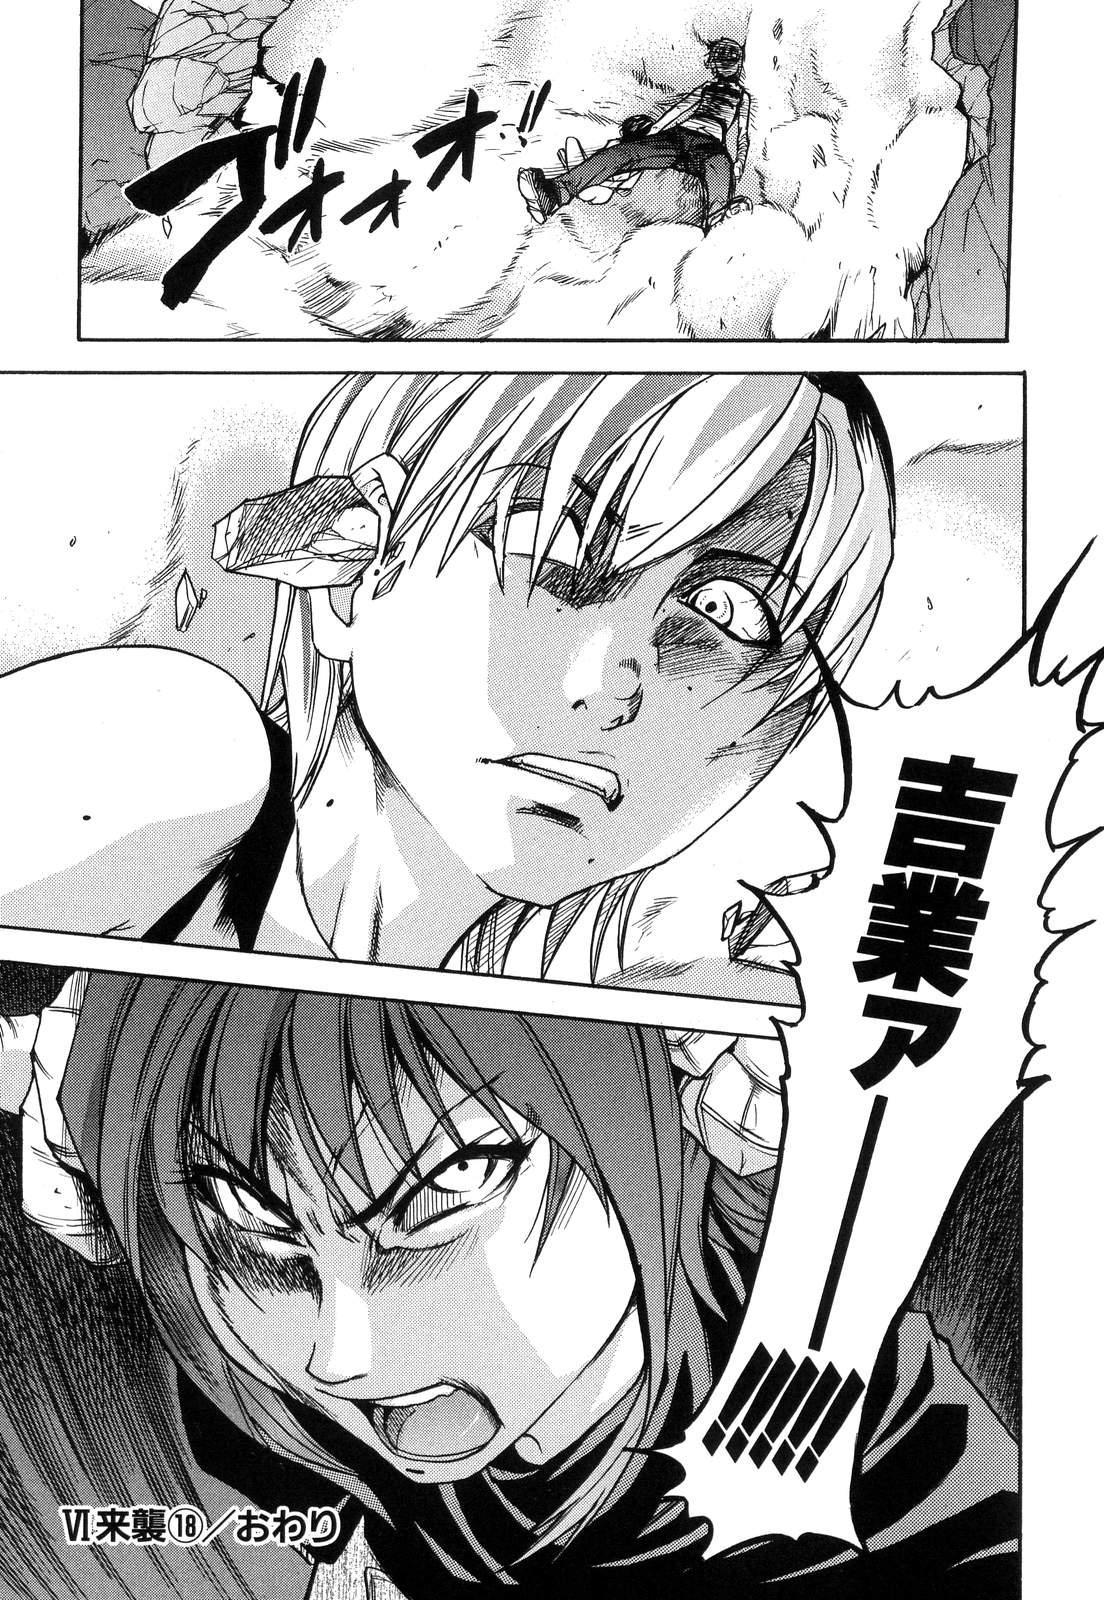 Shining Musume. 6. Rainbow Six 105